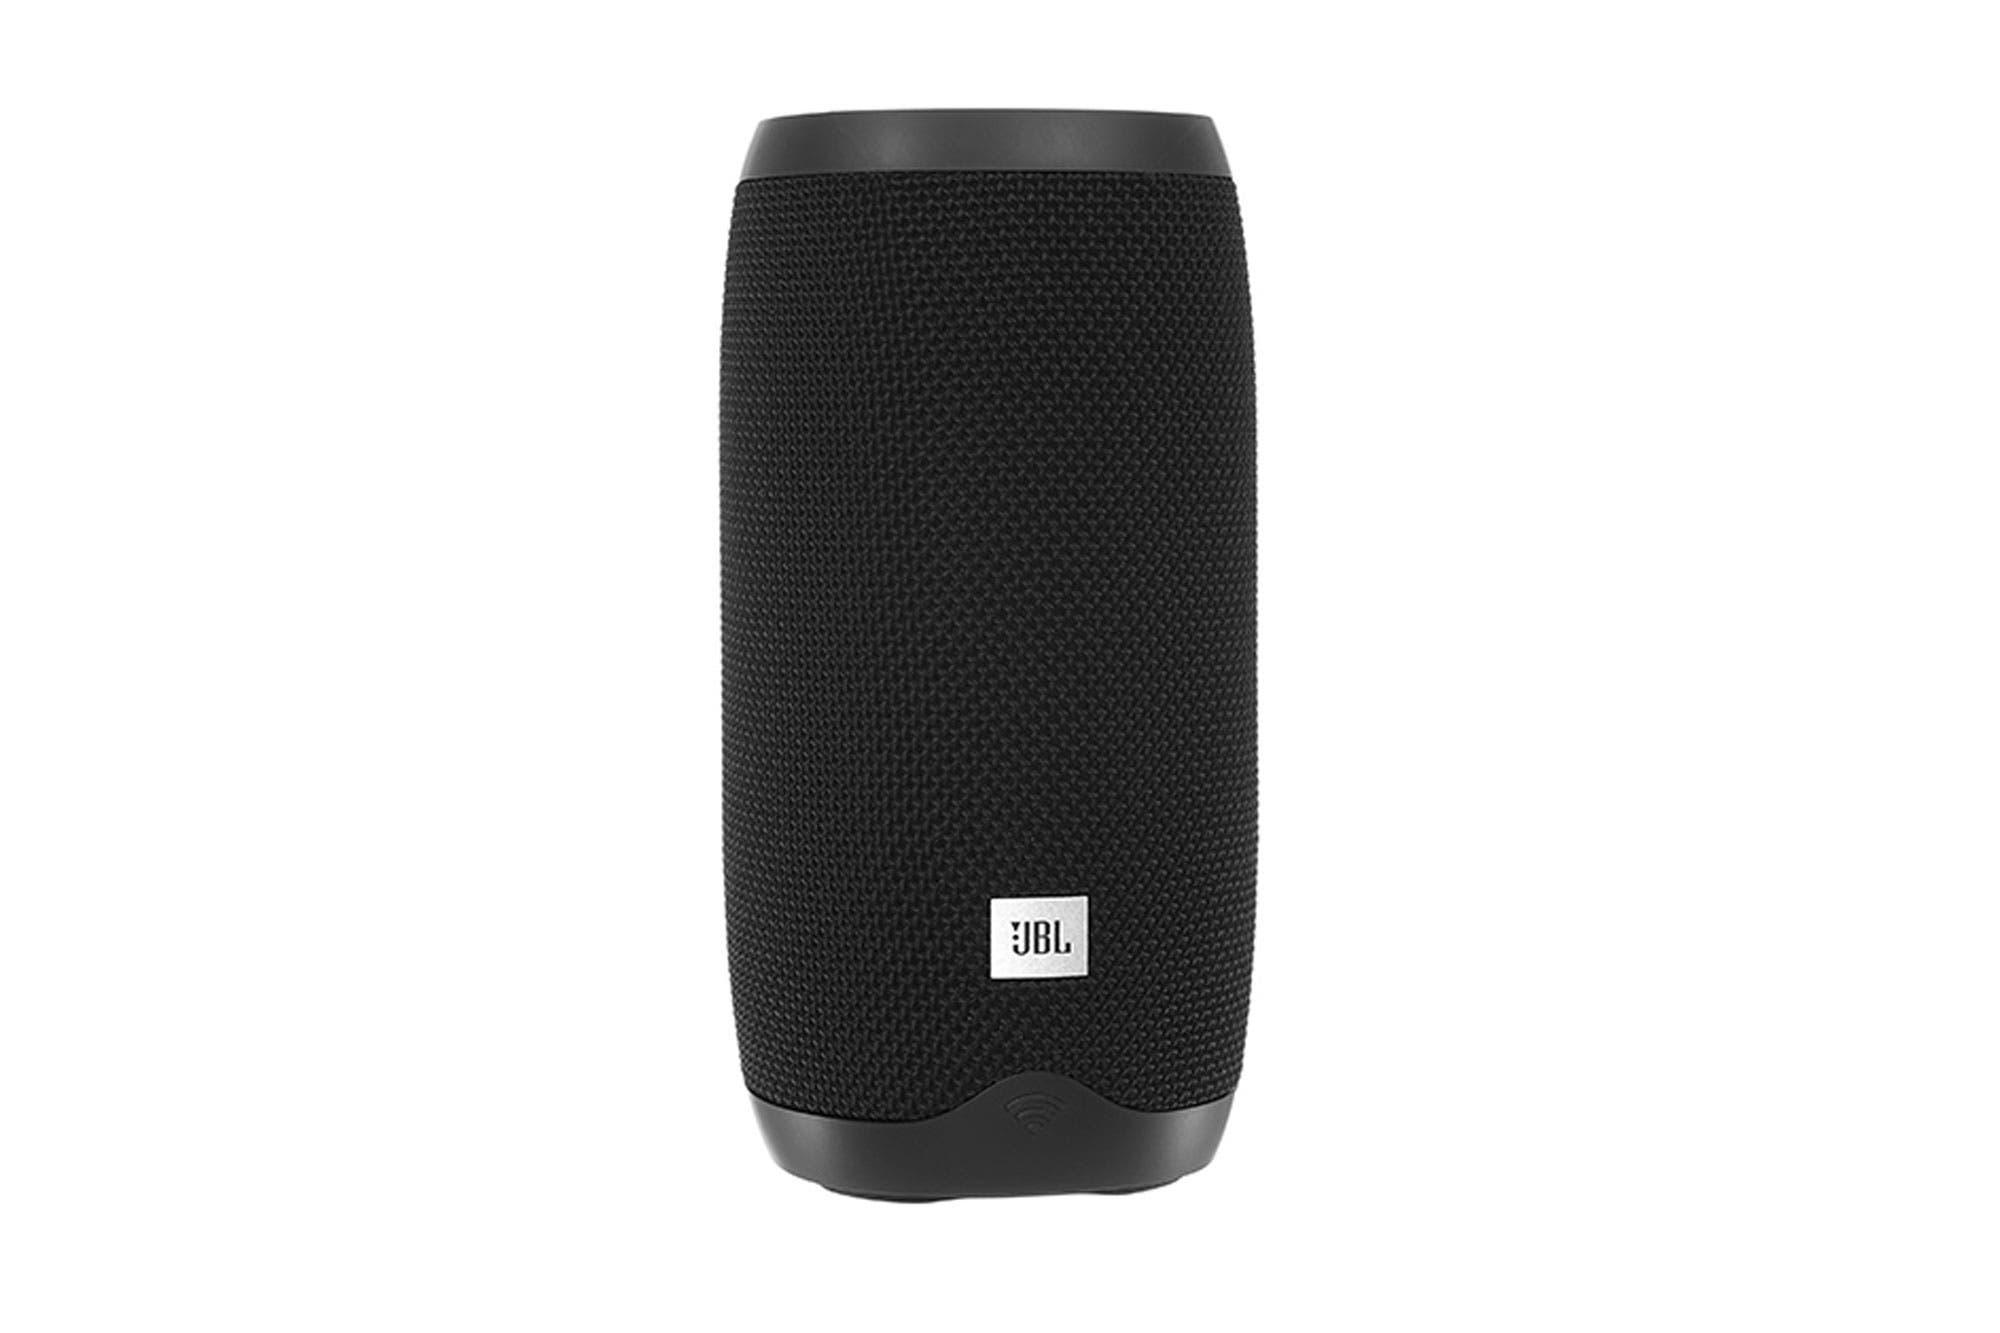 JBL presentó en la Argentina el parlante Bluetooth Link 10 con Google Assistant